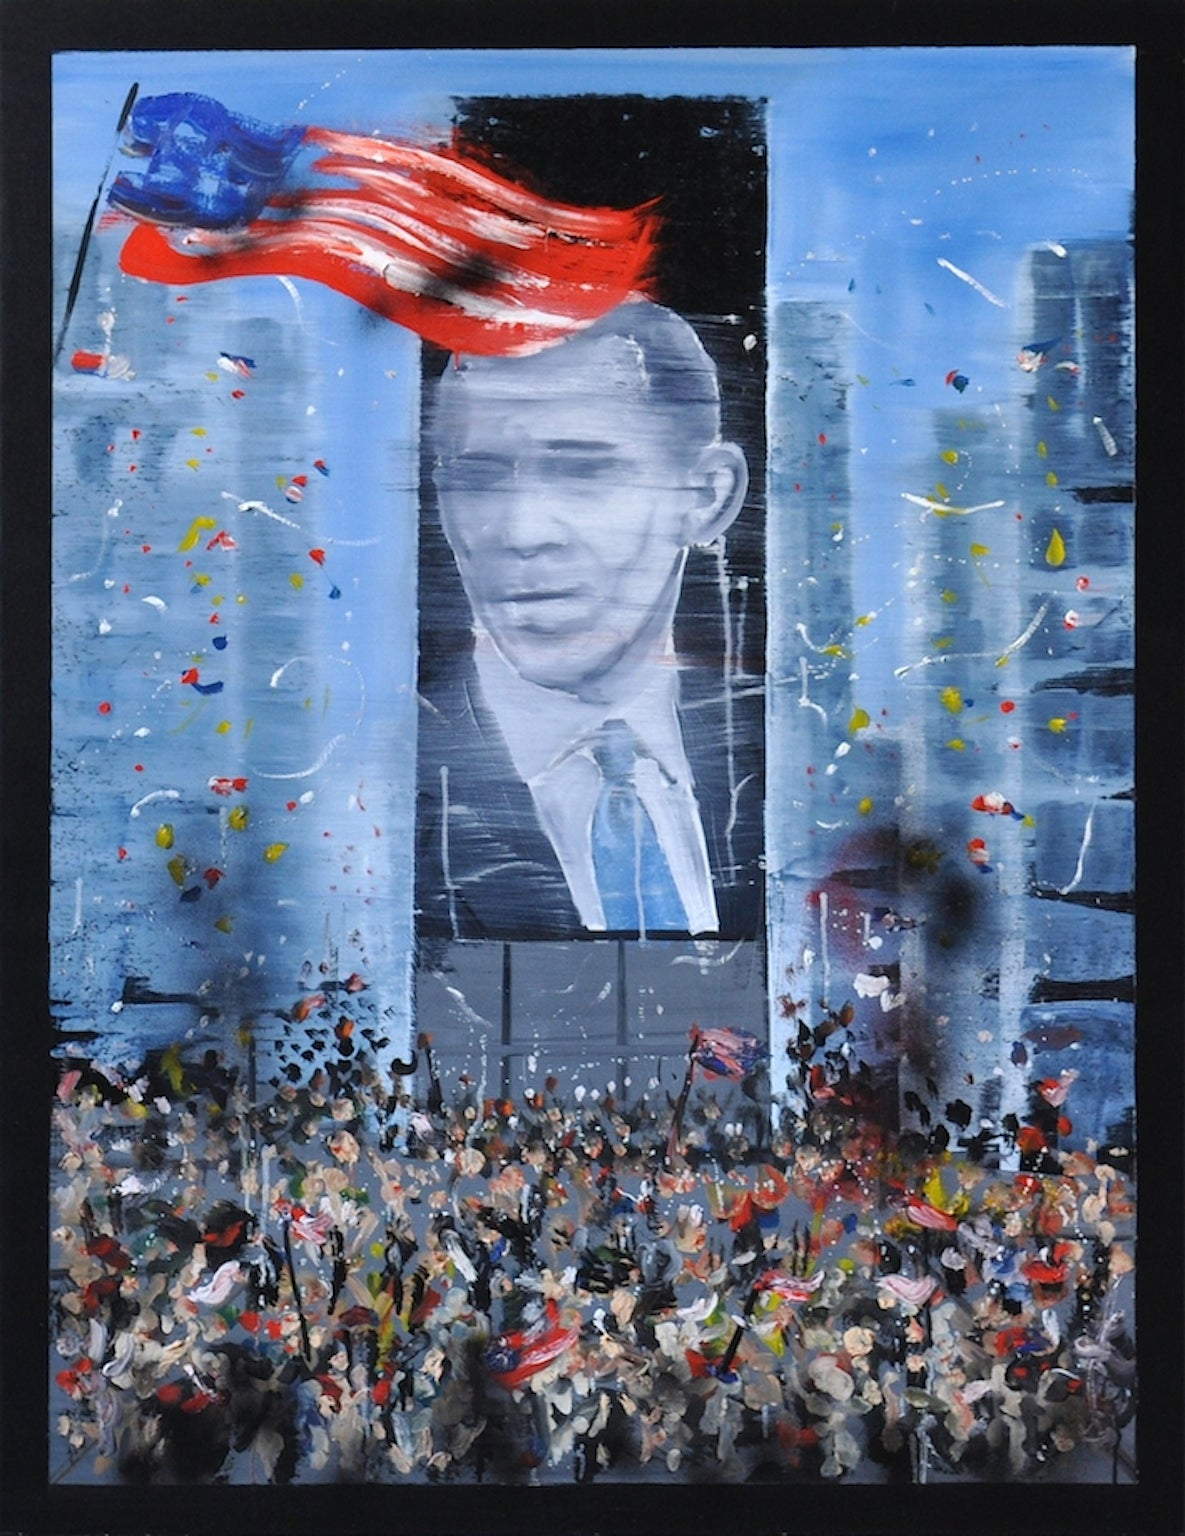 Stéphane Pencréac'h - November 4th 2008 - Obama 1